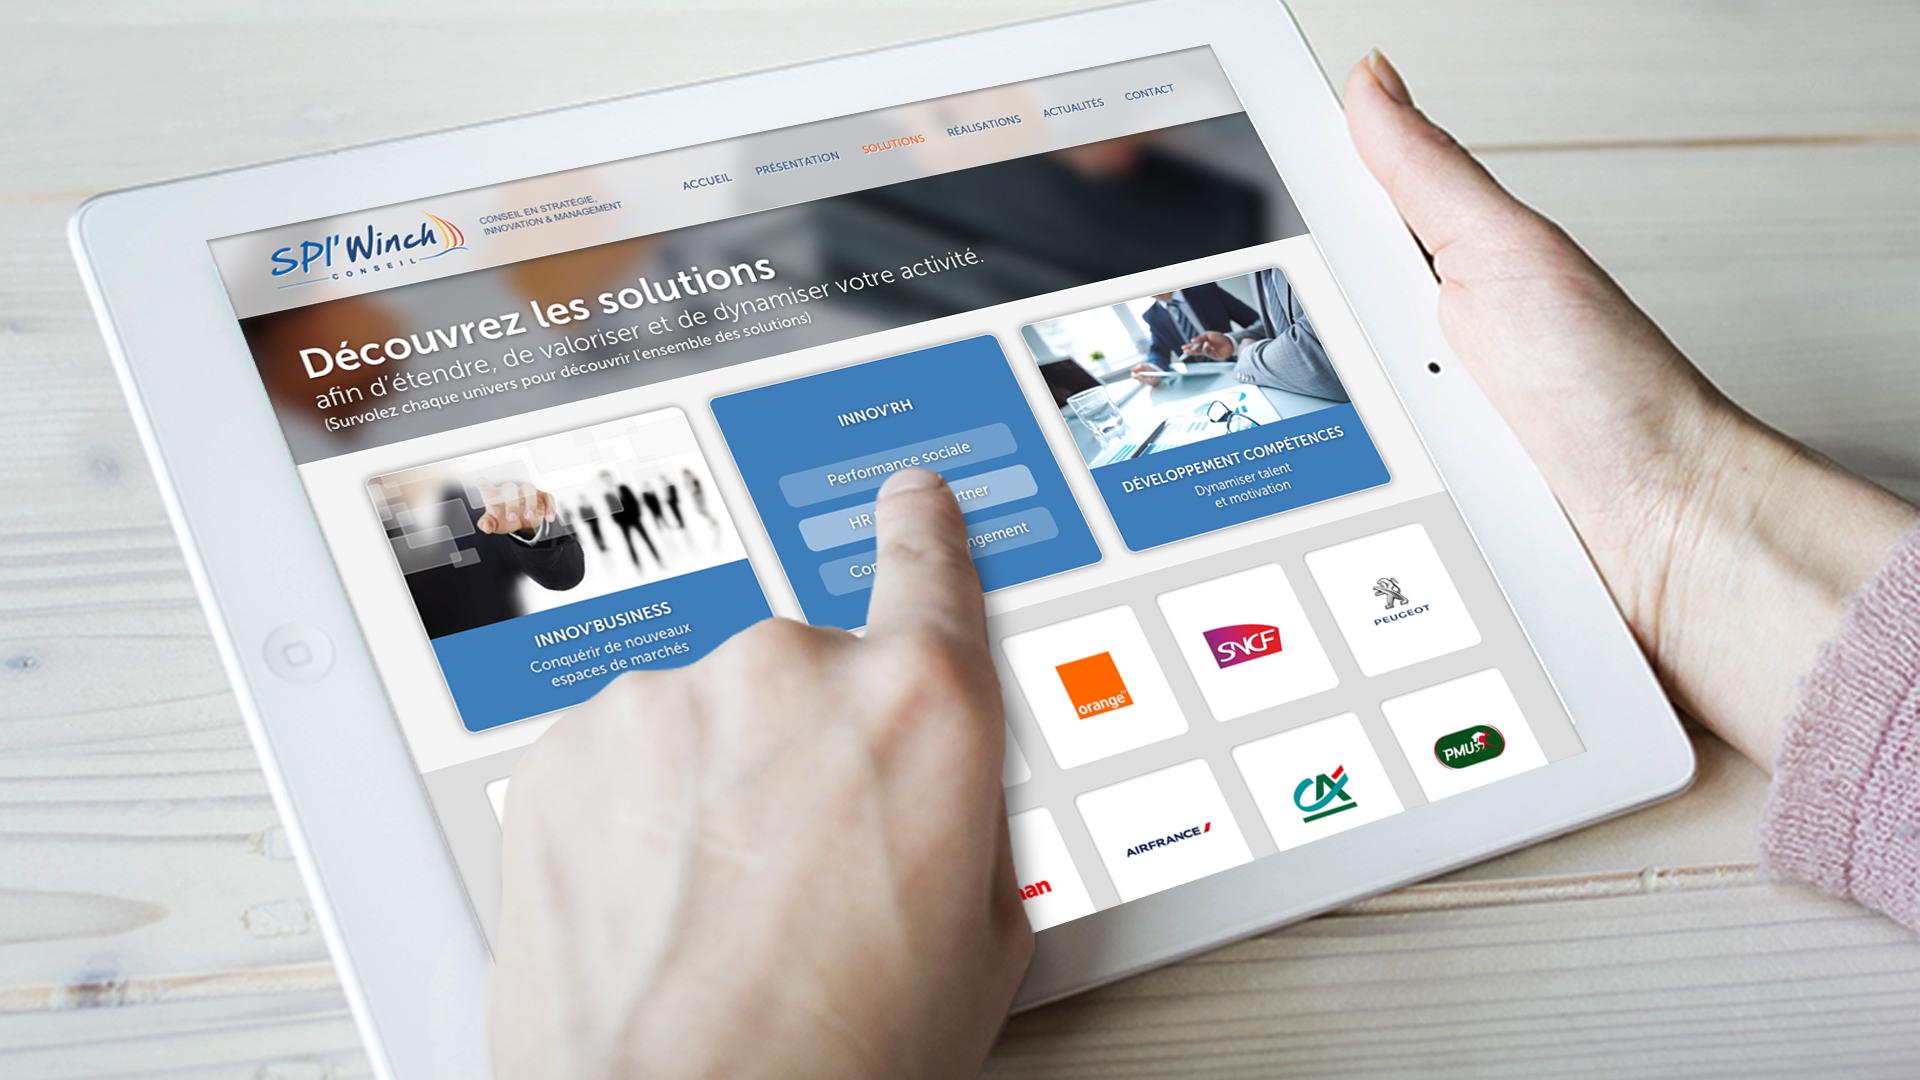 spiwinch-creation-site-web-ipad-responsive-design-caconcept-alexis-cretin-graphiste-montpellier